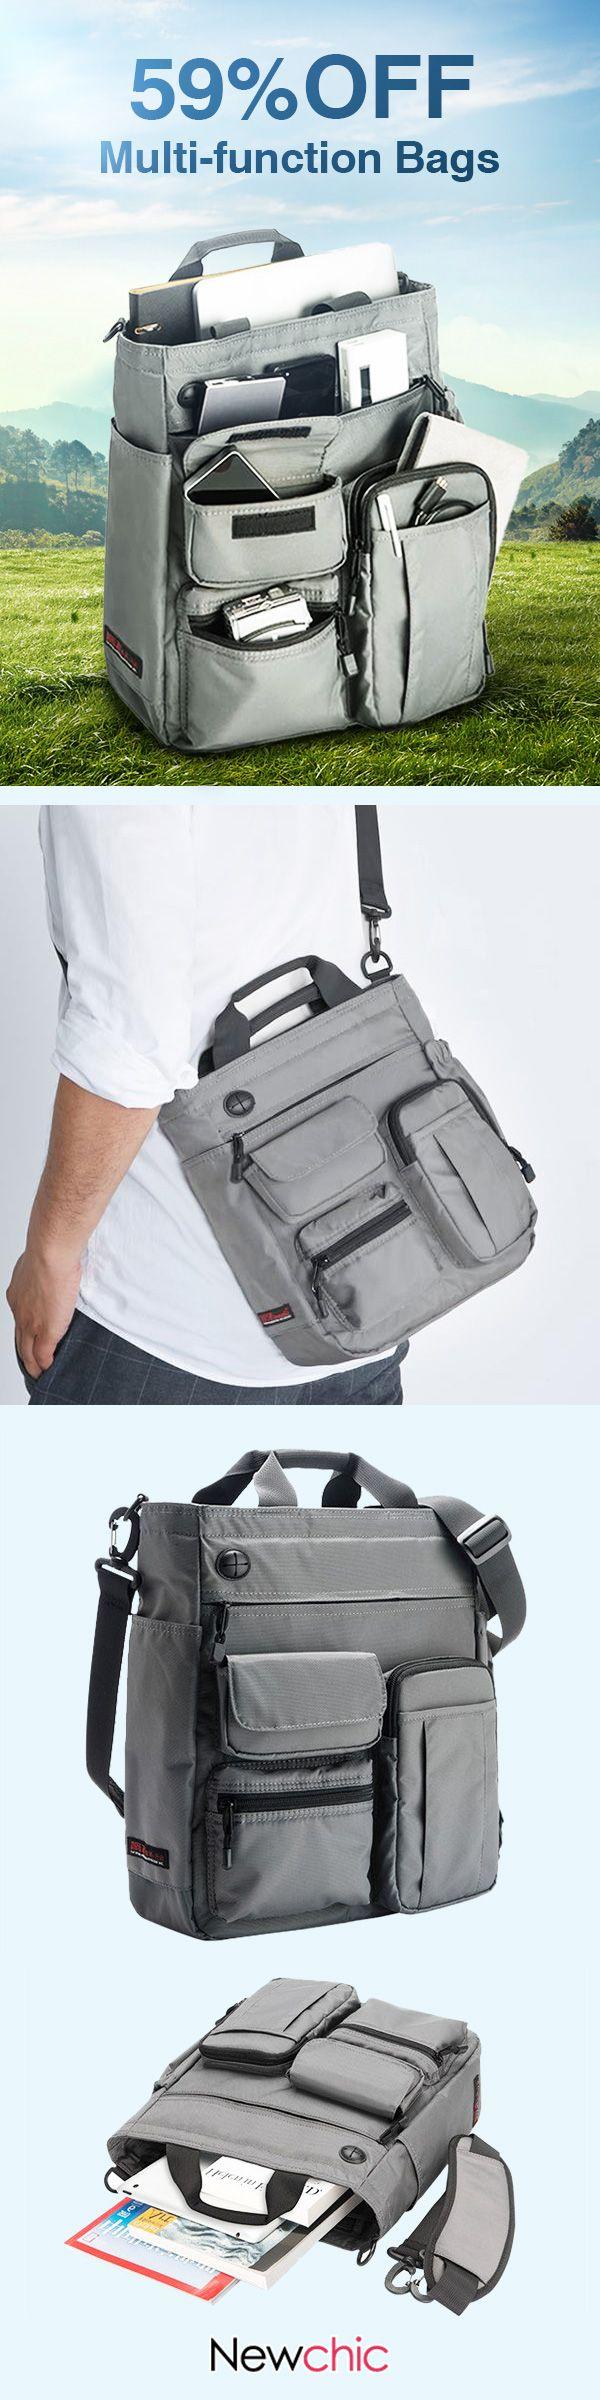 8f2a873a2d Mens Nylon Waterproof Large Capacity Crossbody Bag  Multi-function Business  Computer Handbag travel  business